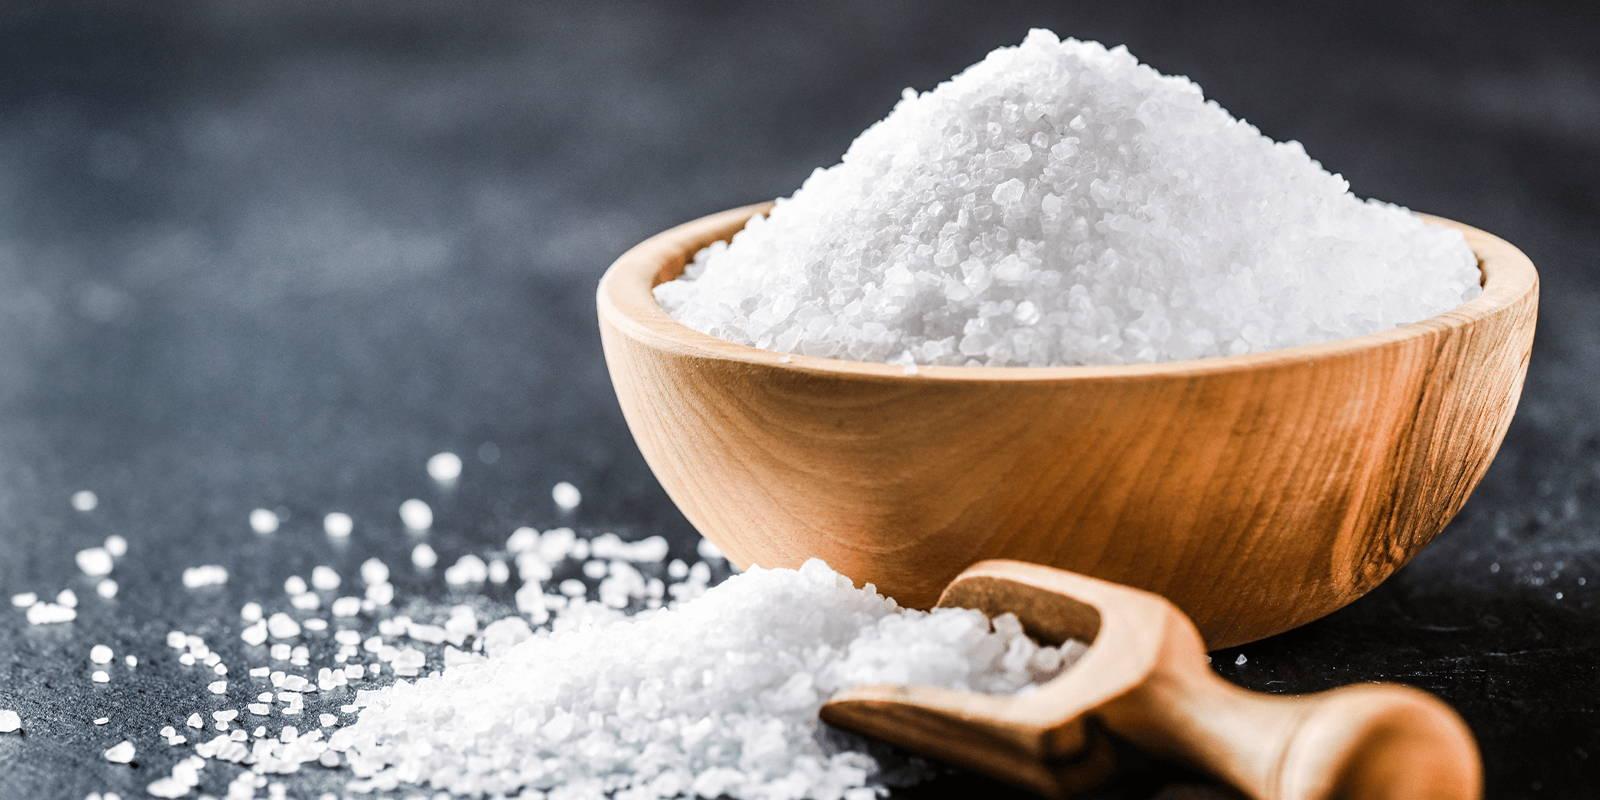 Bowl of coarse salt.